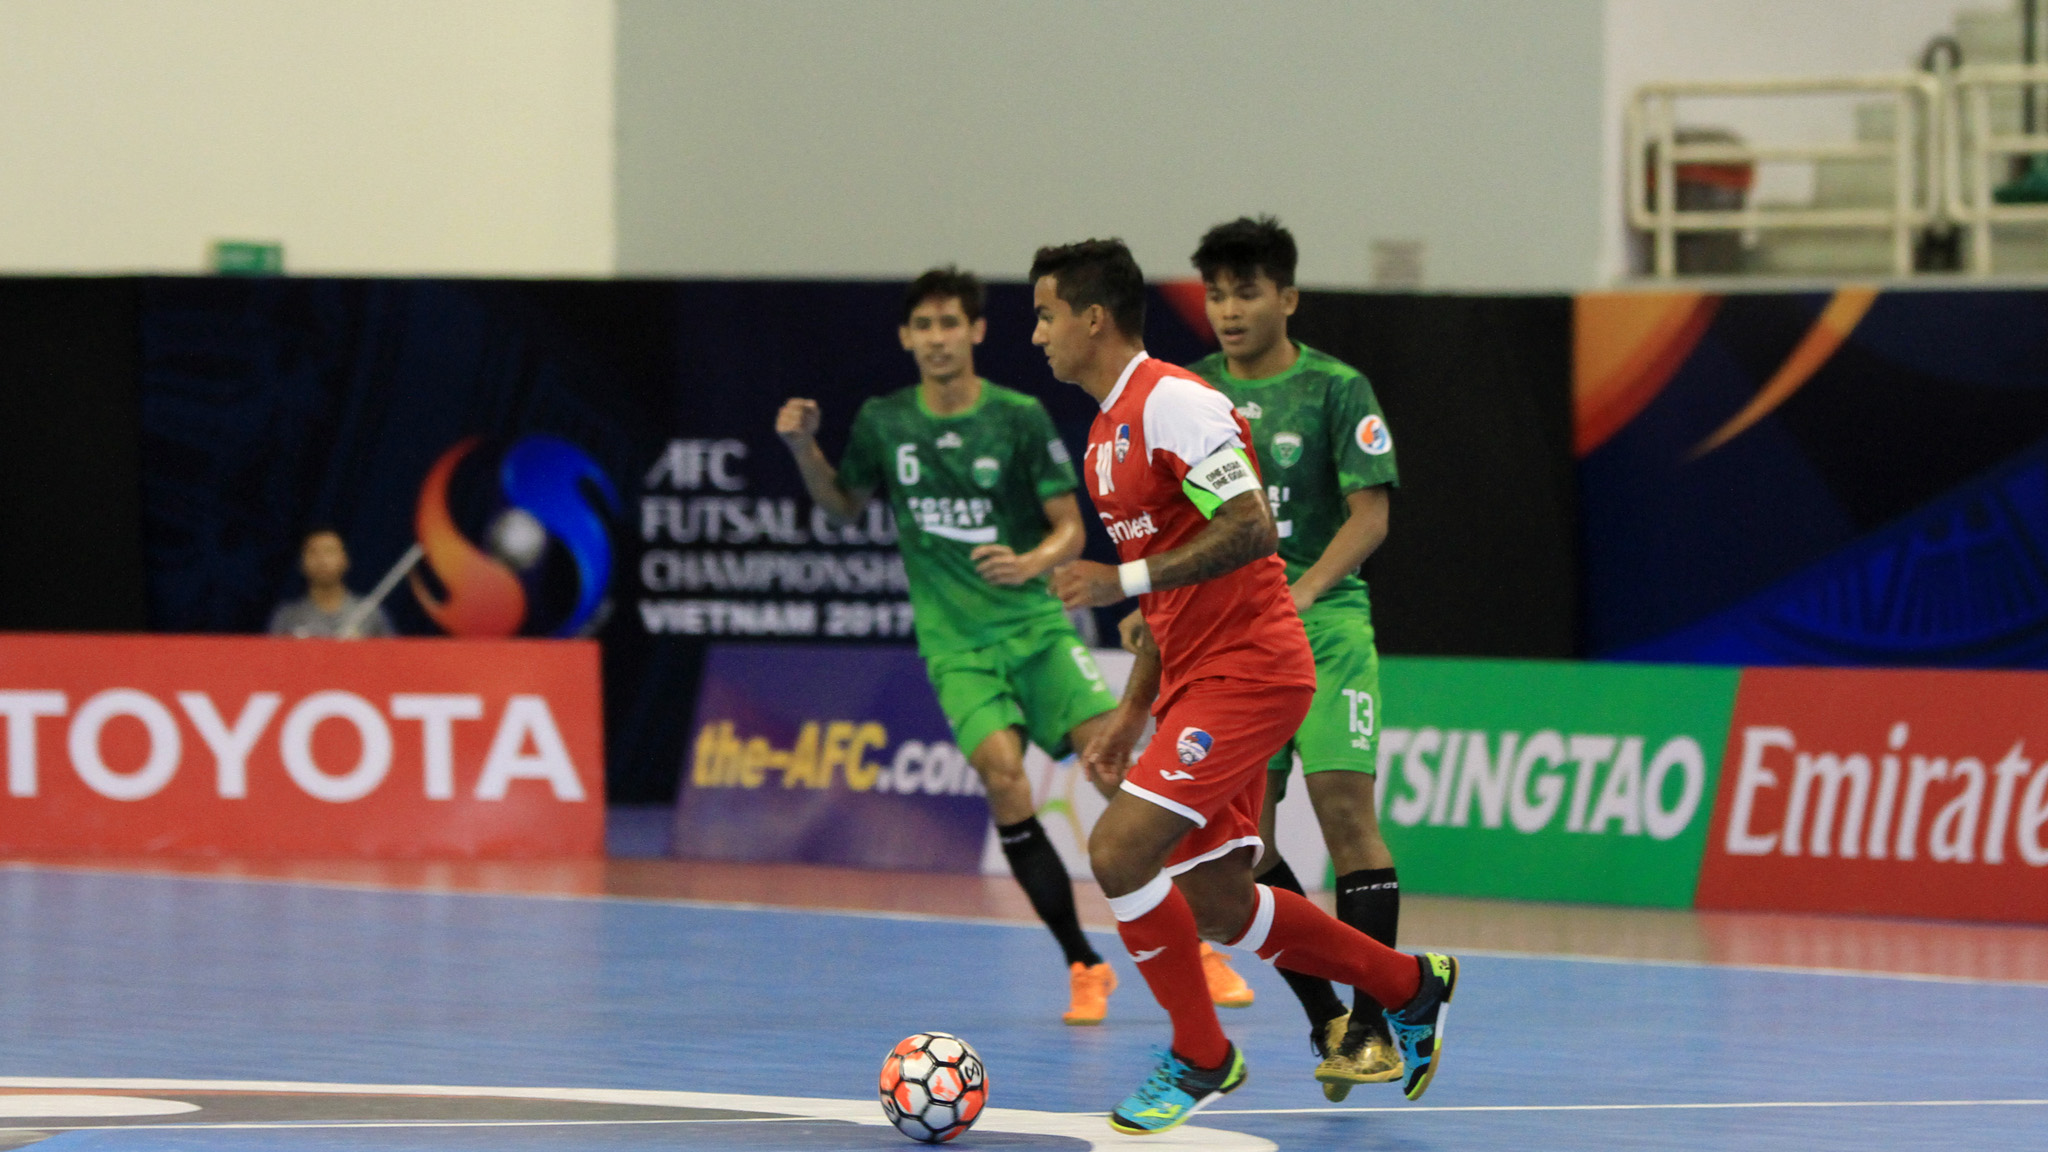 2017 AFC Futsal Club Championship | Vamos (Indonesia) 5-2 Disi Invest (Tajikistan)